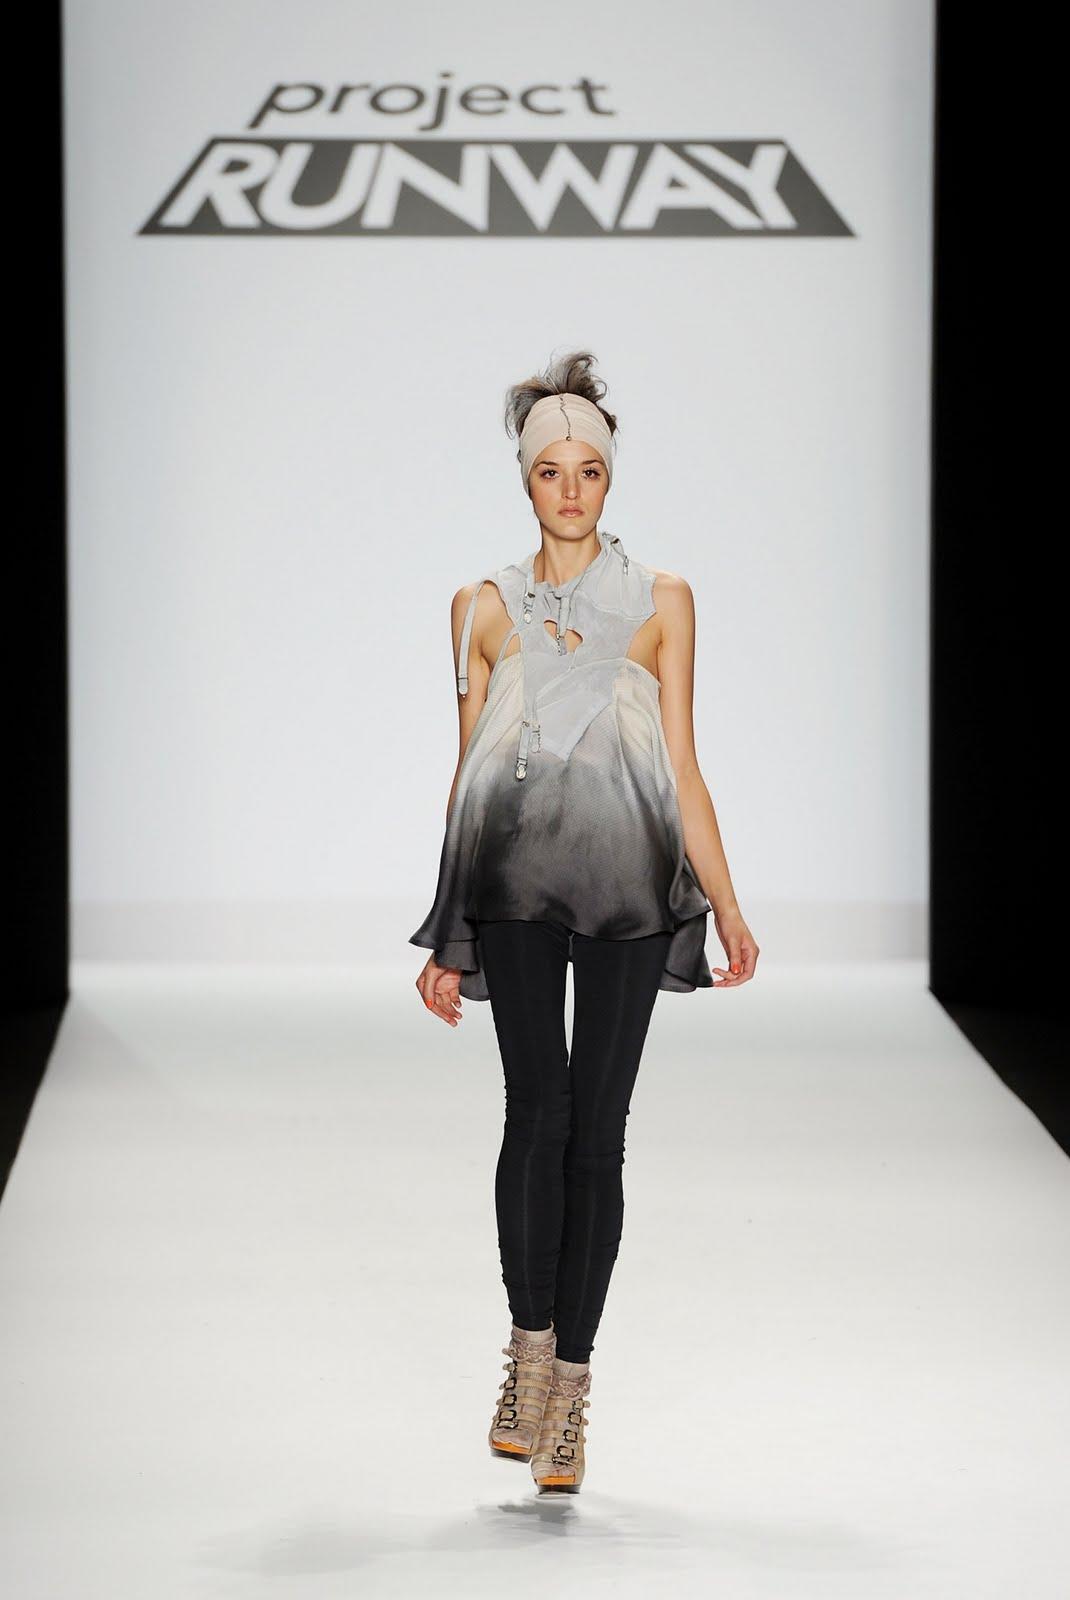 Fashion Week Project Runway Designers